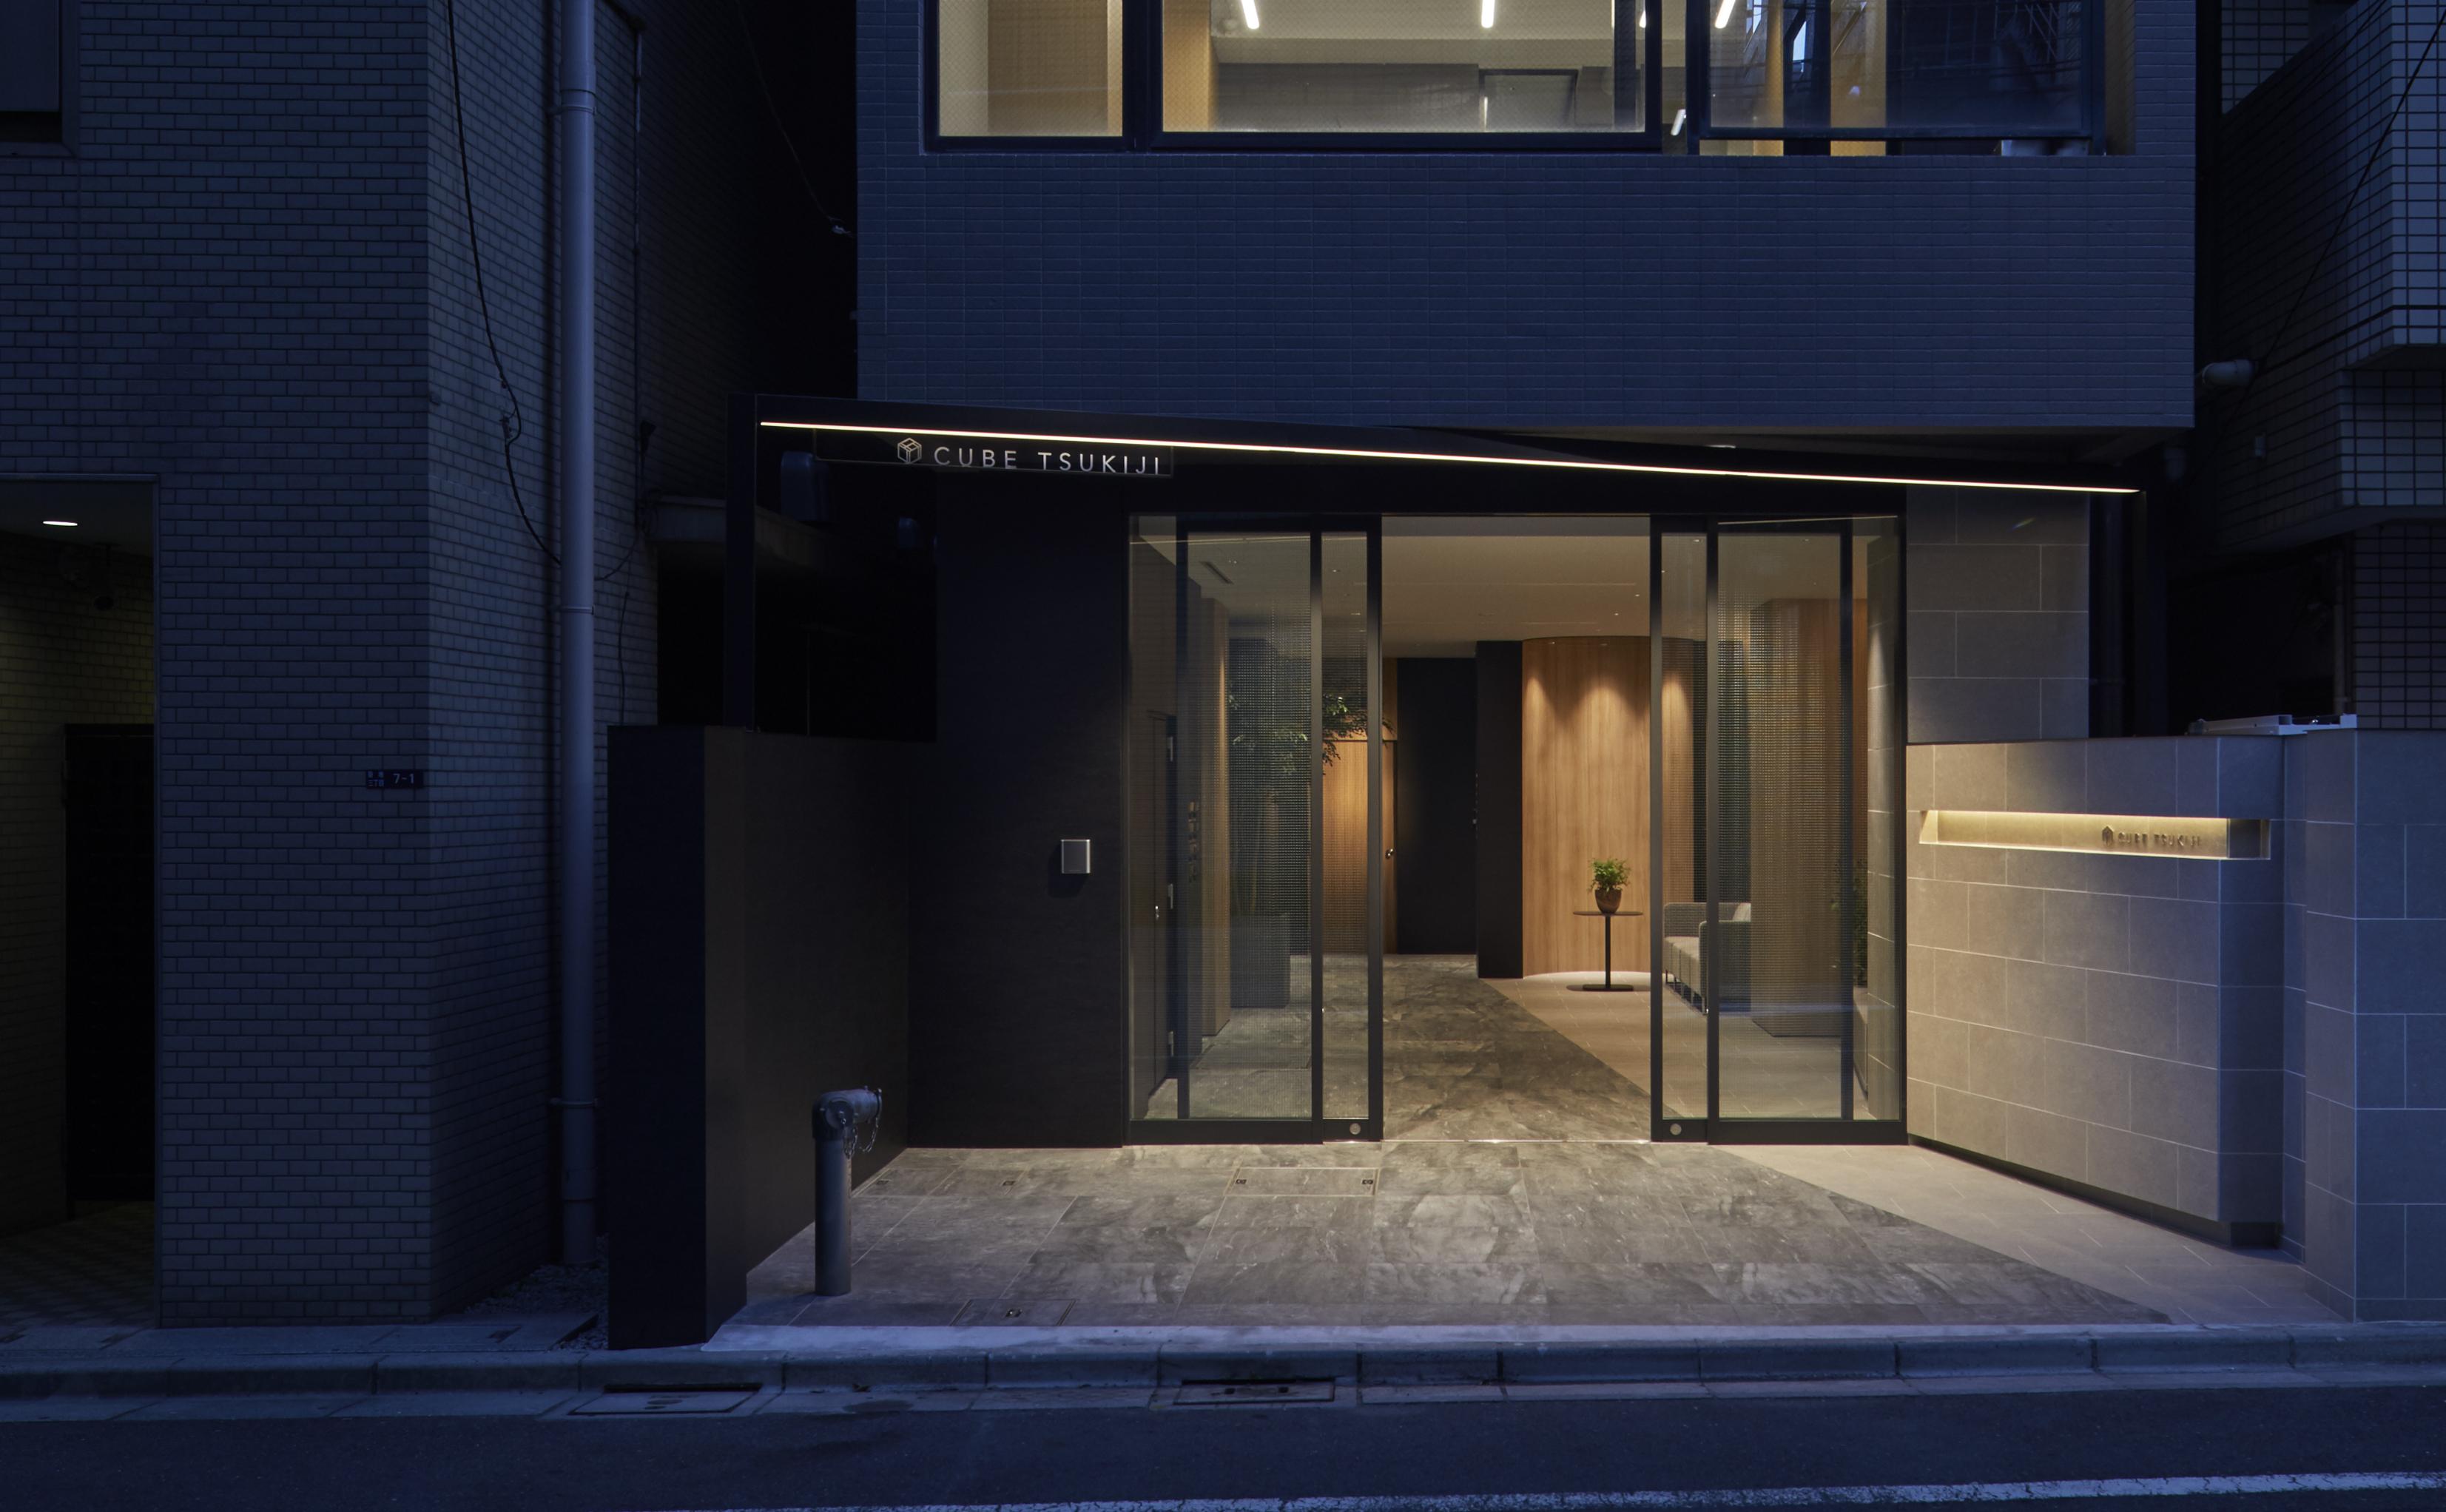 cube_tsukiji_000